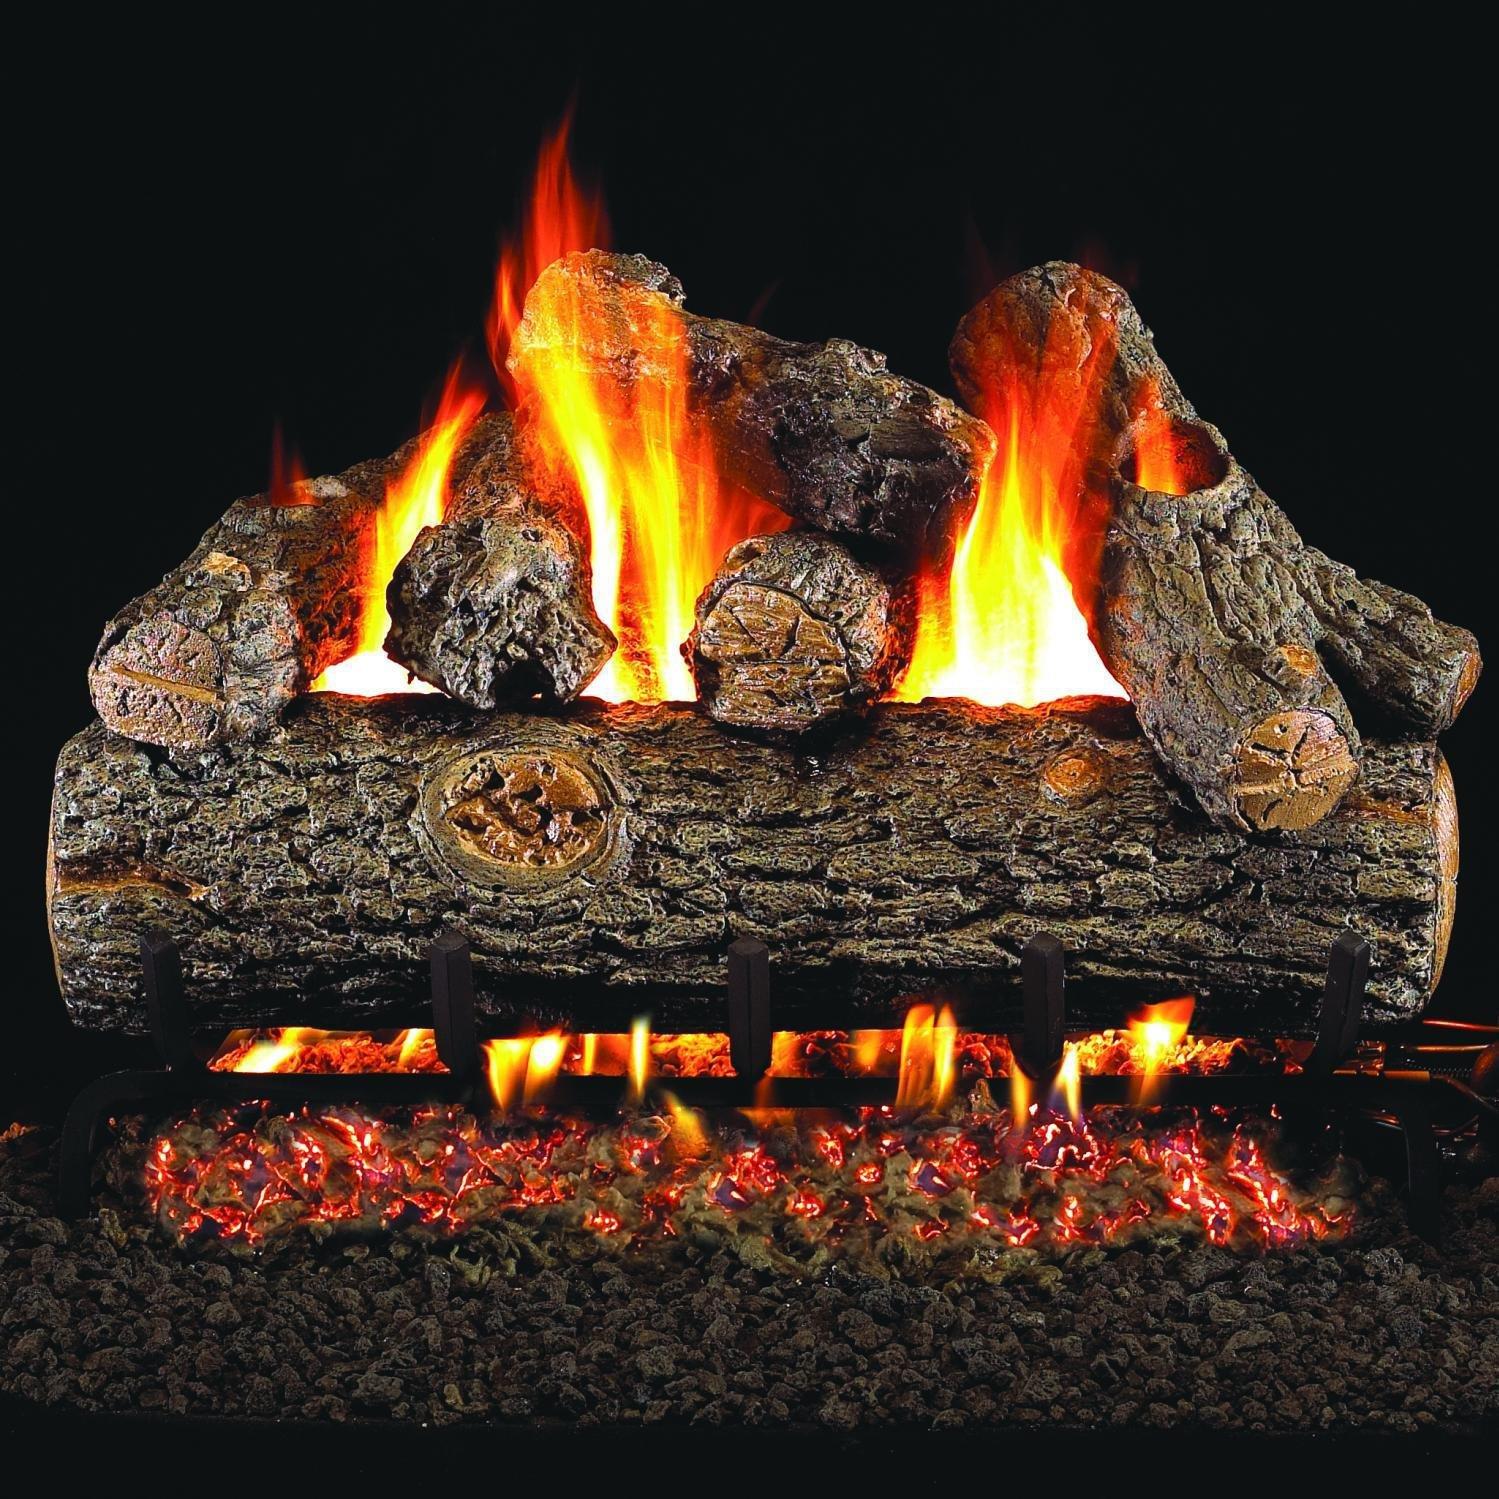 Peterson Real Fyre 20-inch Golden Oak Designer Plus Gas Log Set With Vented Natural Gas G4 Burner - Match Light by Peterson Real Fyre